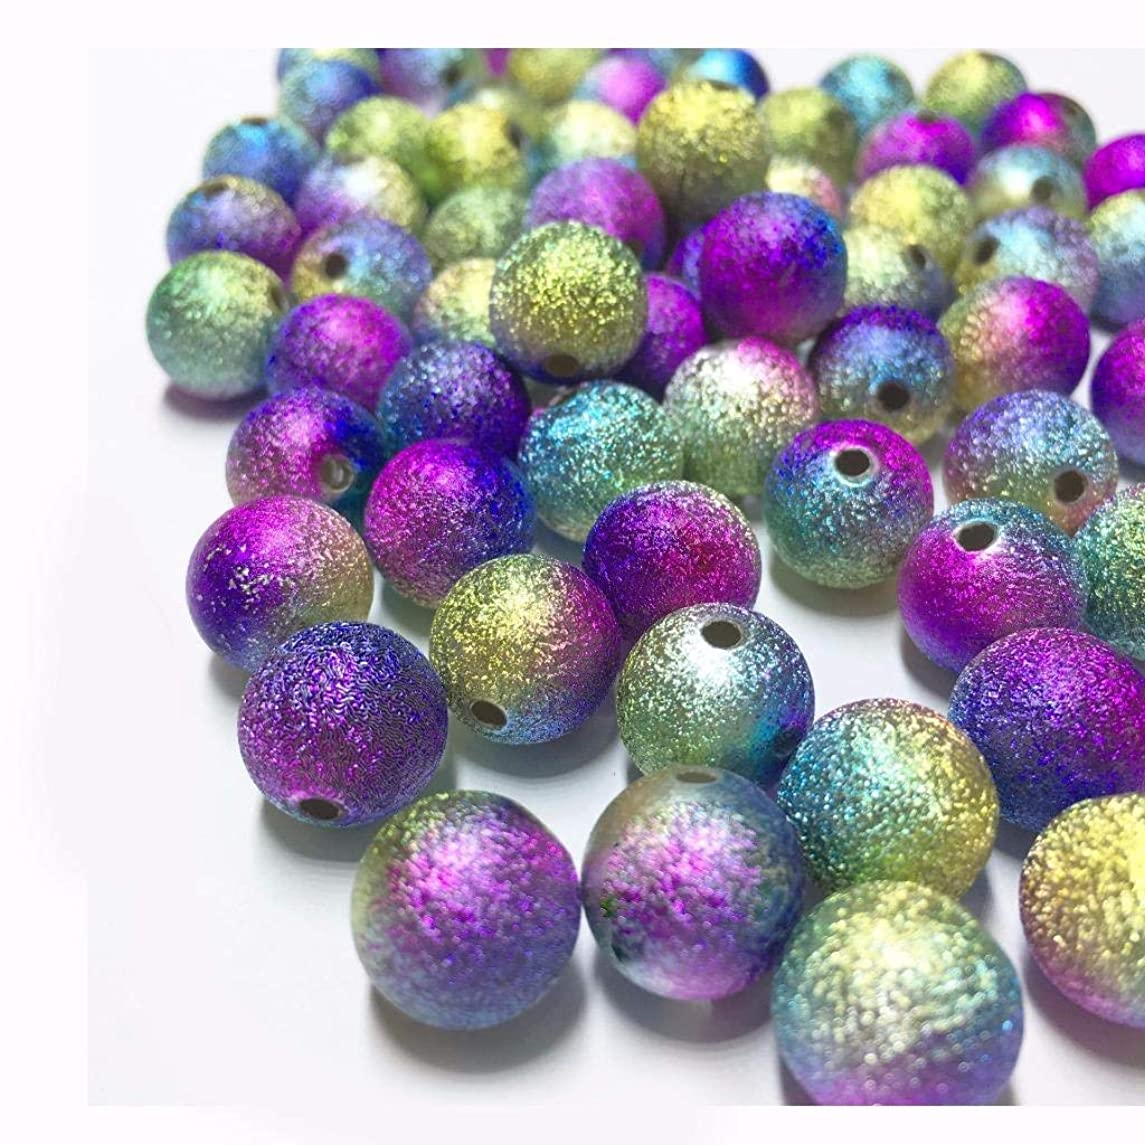 Round Stardust Beads Colorful Lava Gemstone Matte Textured Rainbow Aura Titanium Coated (6mm / 8mm / 12mm / 18mm) Energy Stone Healing Power for Jewelry Making